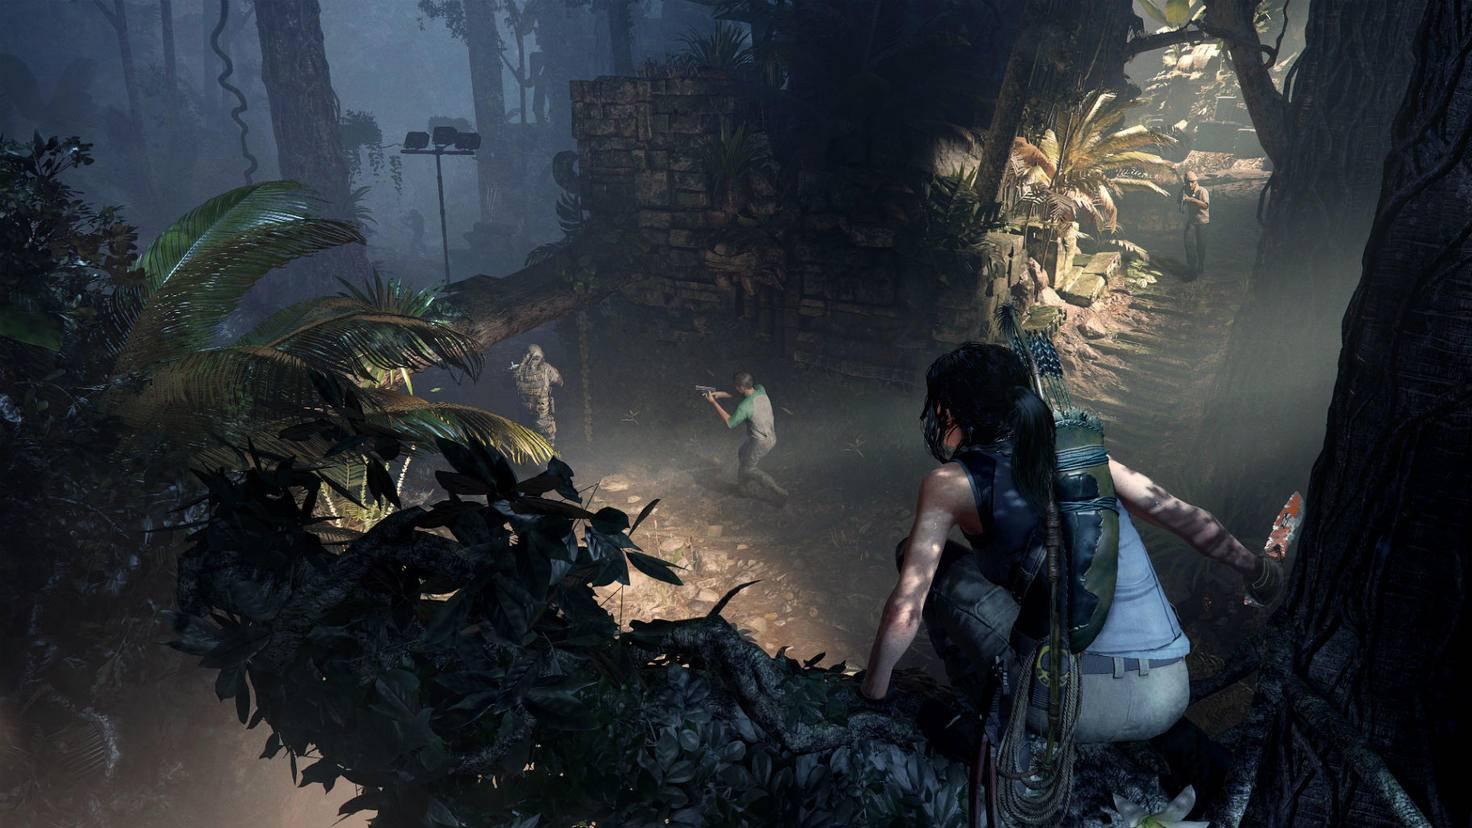 shadow-of-the-tomb-raider-screenshot-04